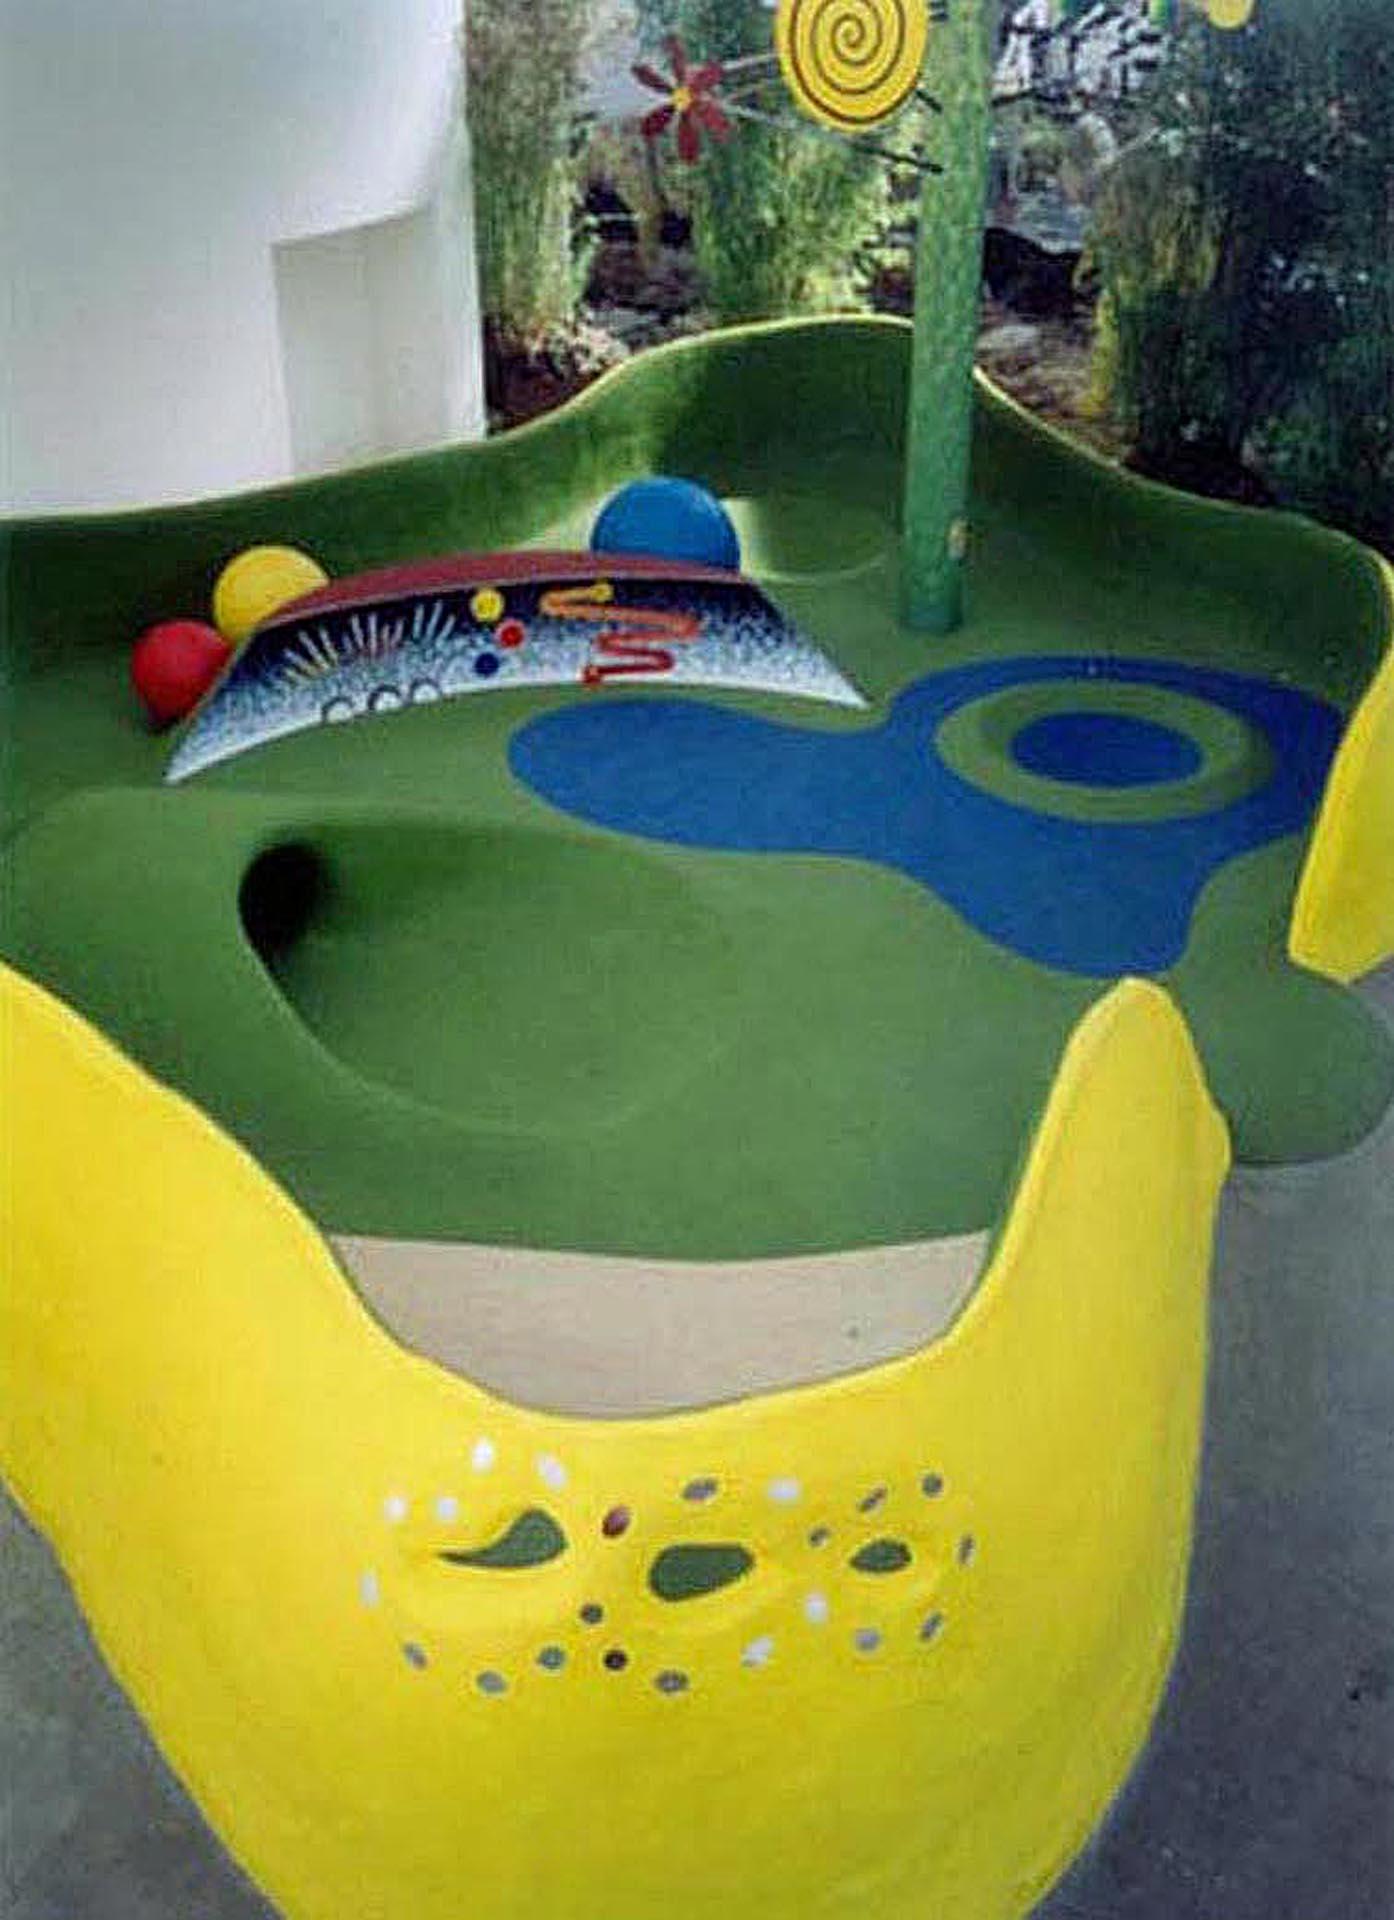 Toddler's Exhibit - Children's Museum of San Diego